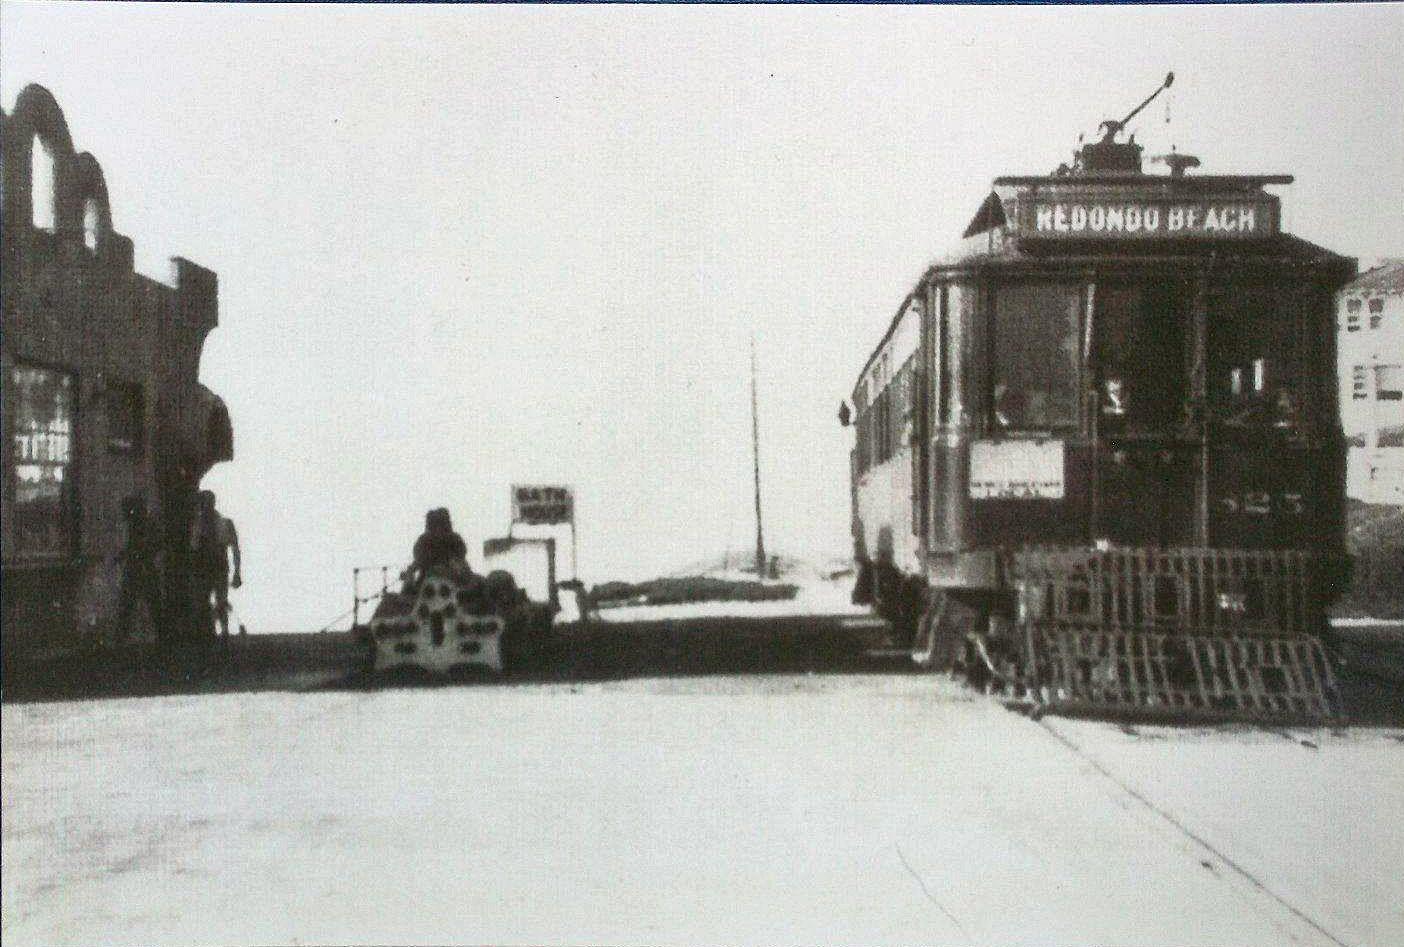 Old Train In Manhattan Beach Headed For Redondo Beach California Along The Coast Redondo Beach California Manhattan Beach California Redondo Beach